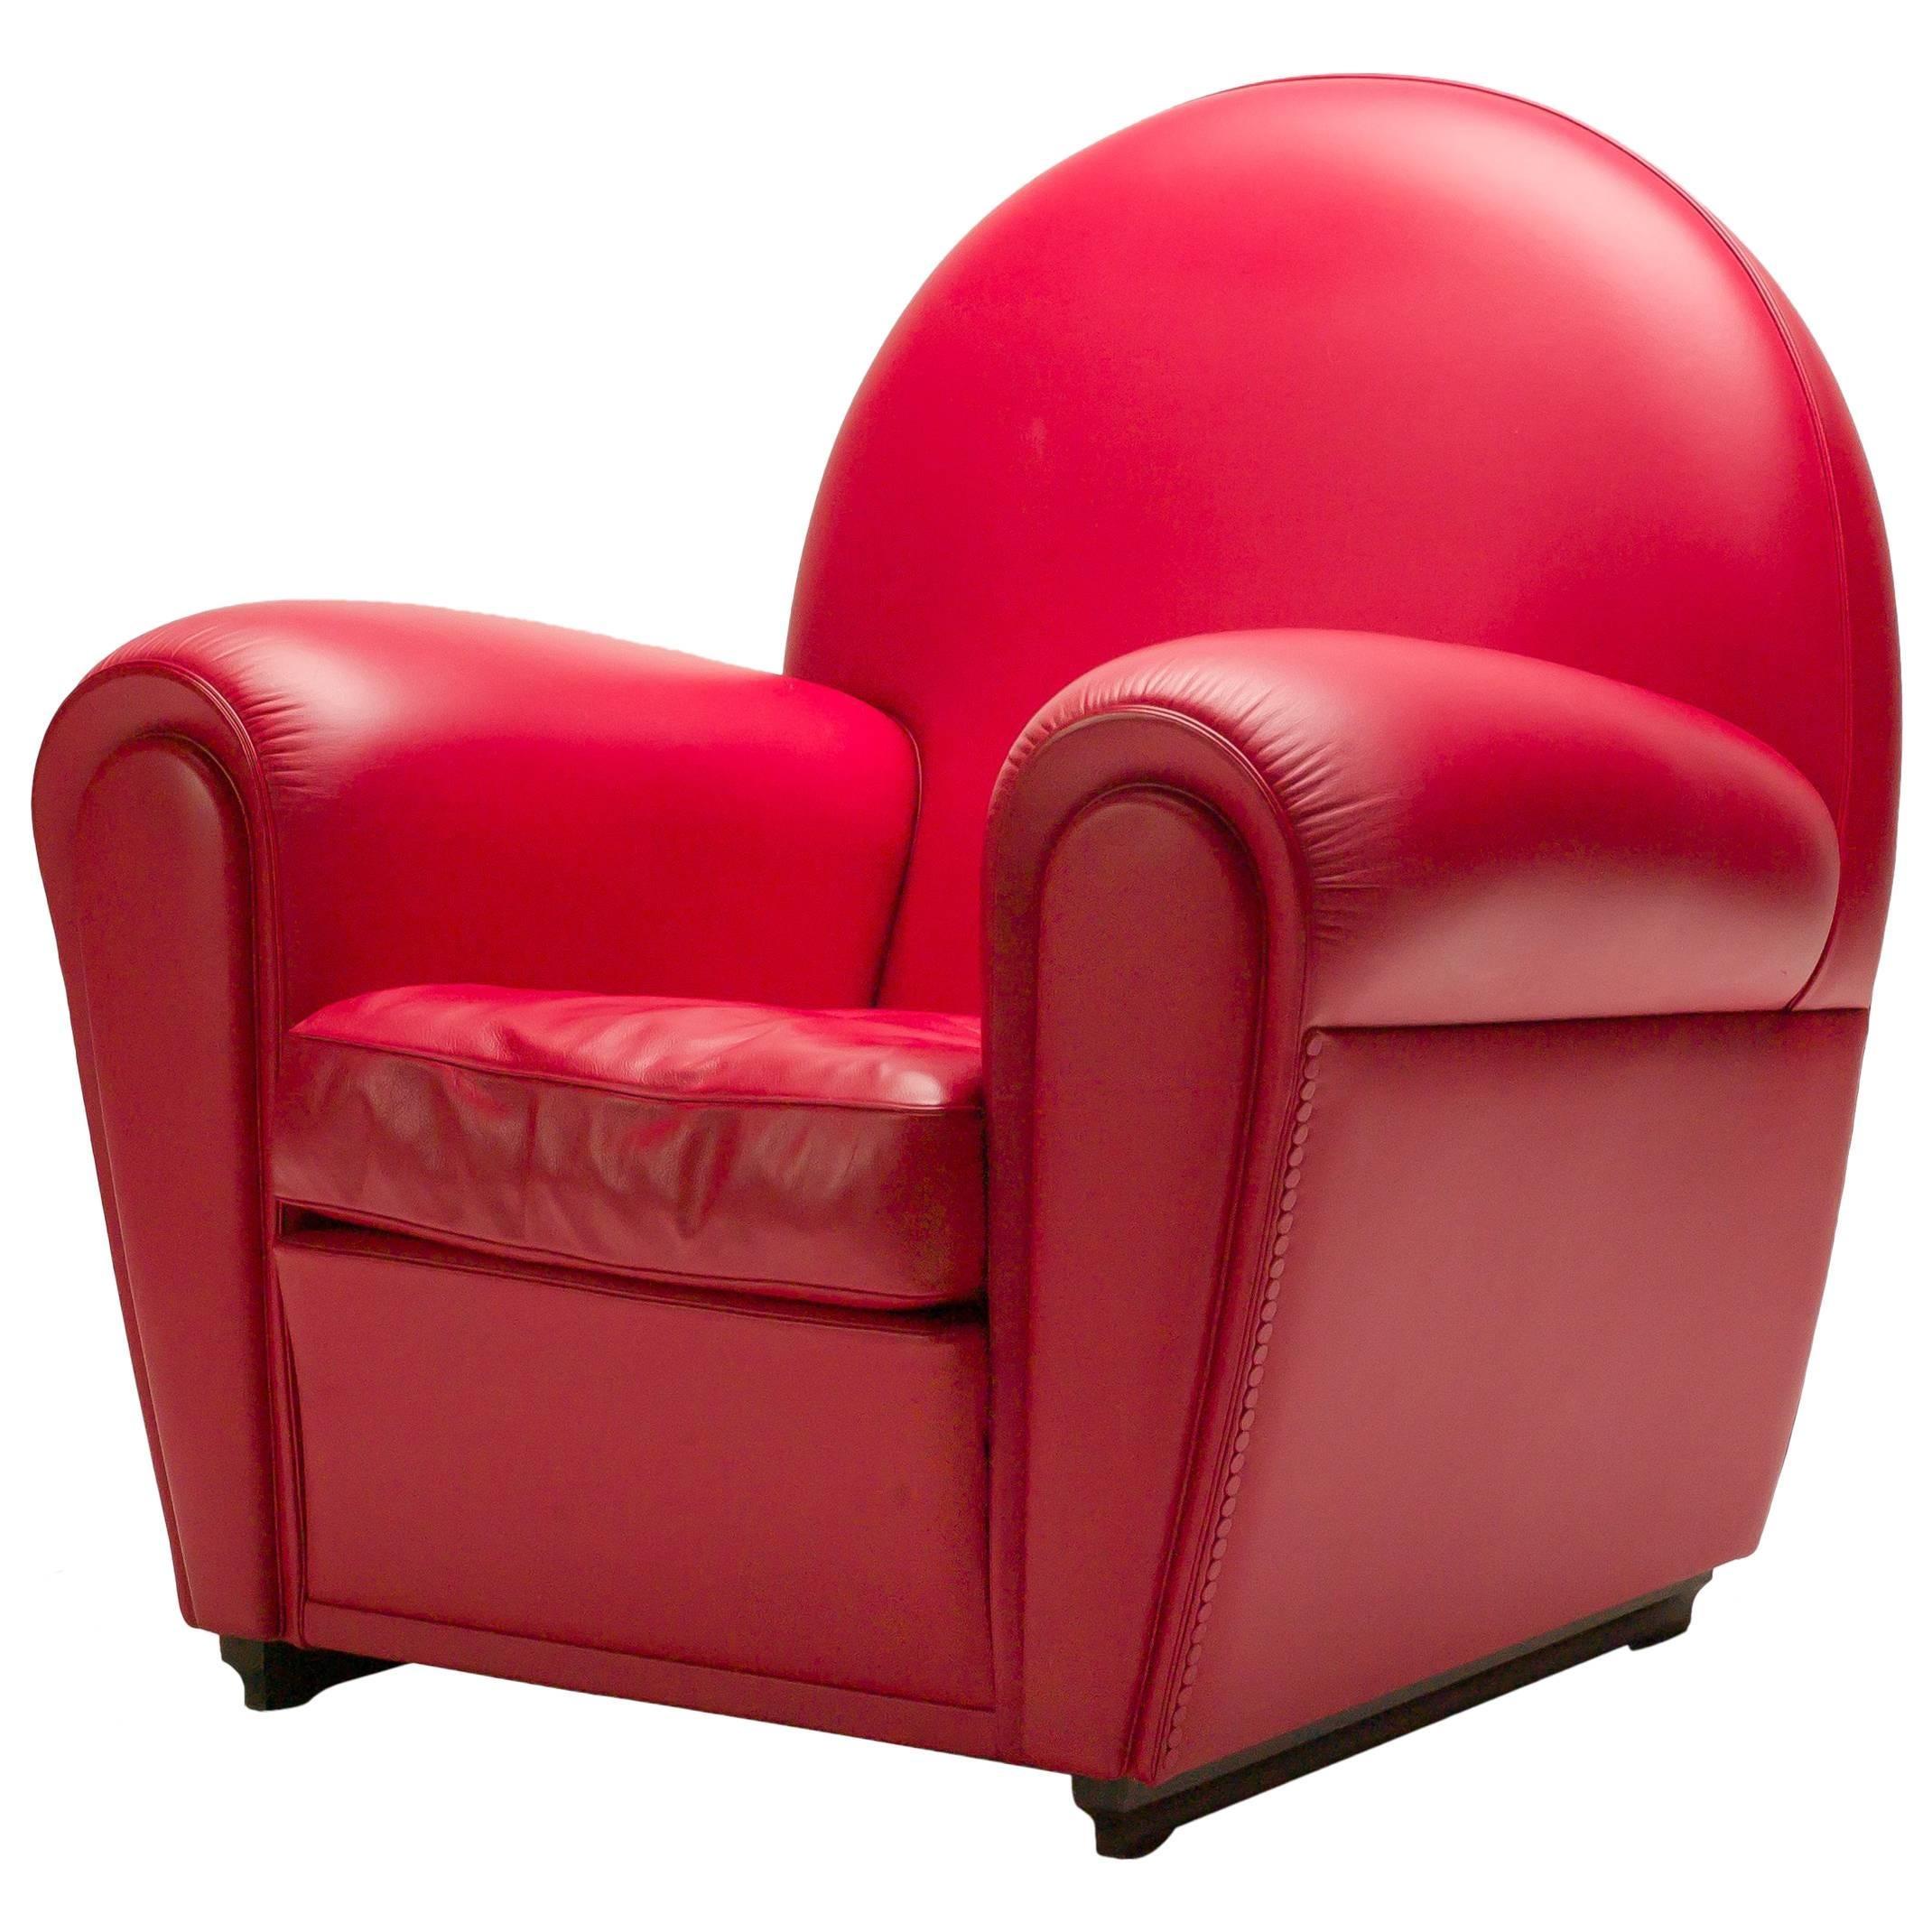 Poltrona Frau Vanity Fair Armchair By Renzo Frau 1